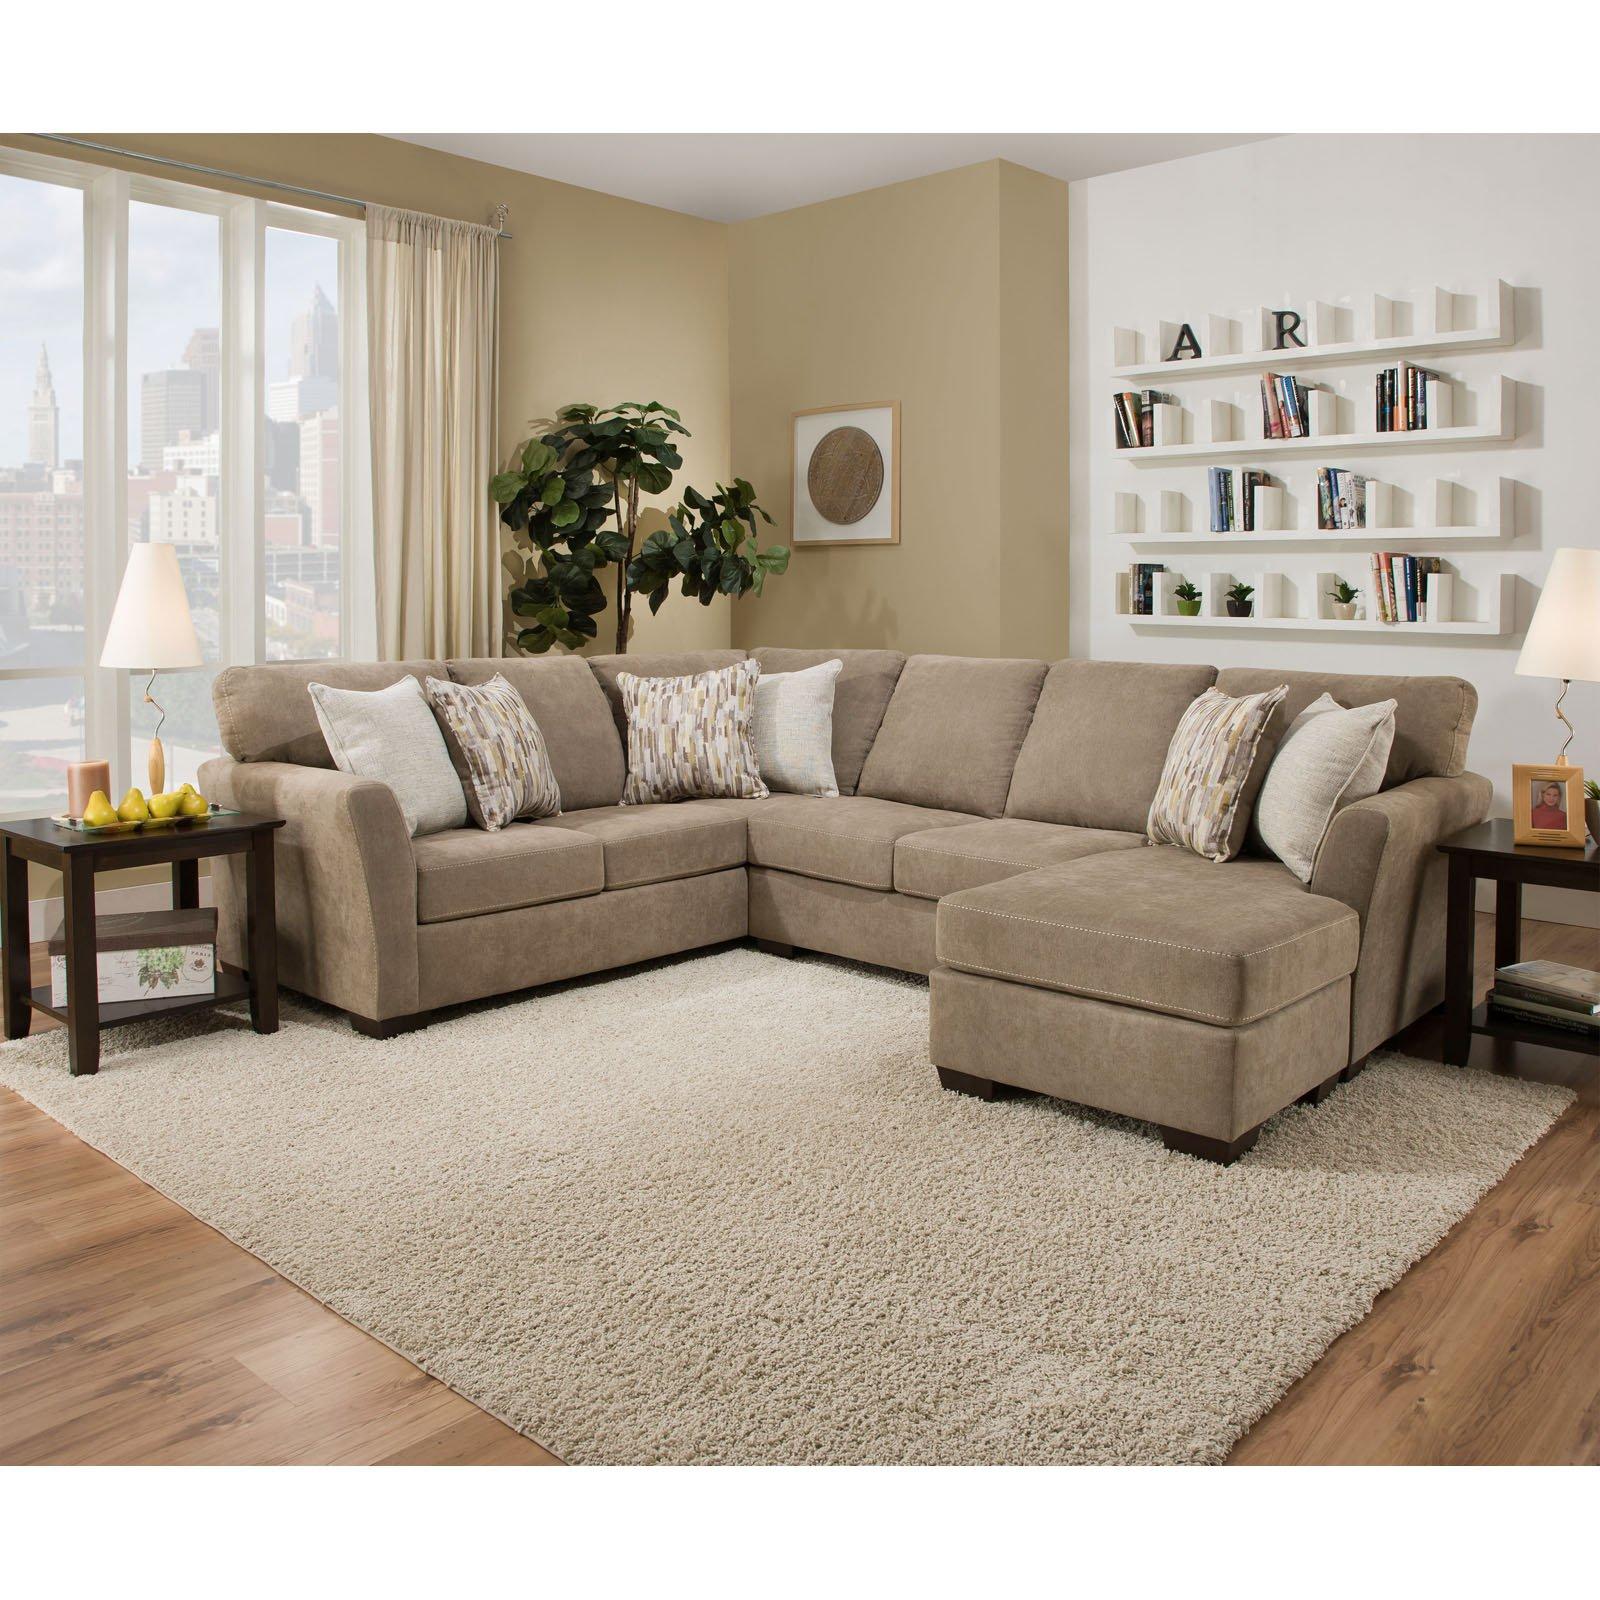 Simmons Upholstery Pacific Sectional Sofa Sectional Sofa Lane